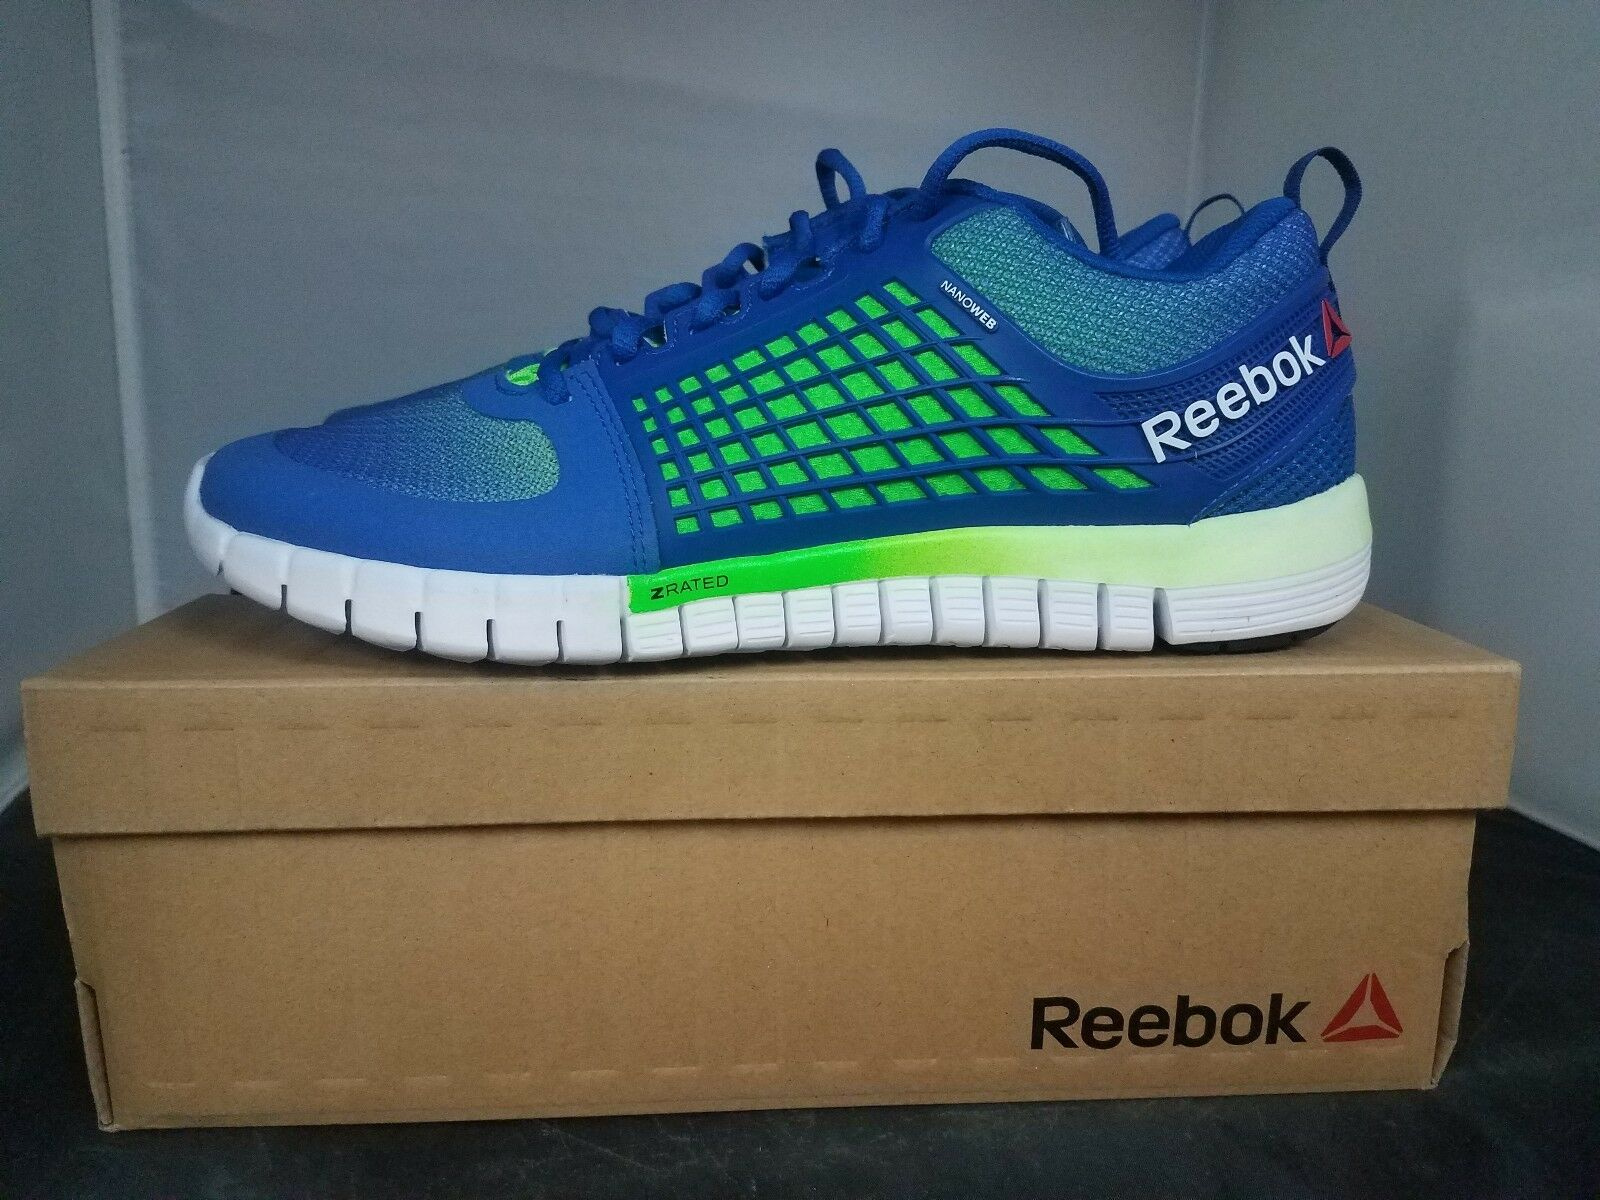 REEBOK ZQUICK ELECTRIFY Mens Running shoes bluee Green Black White - NEW